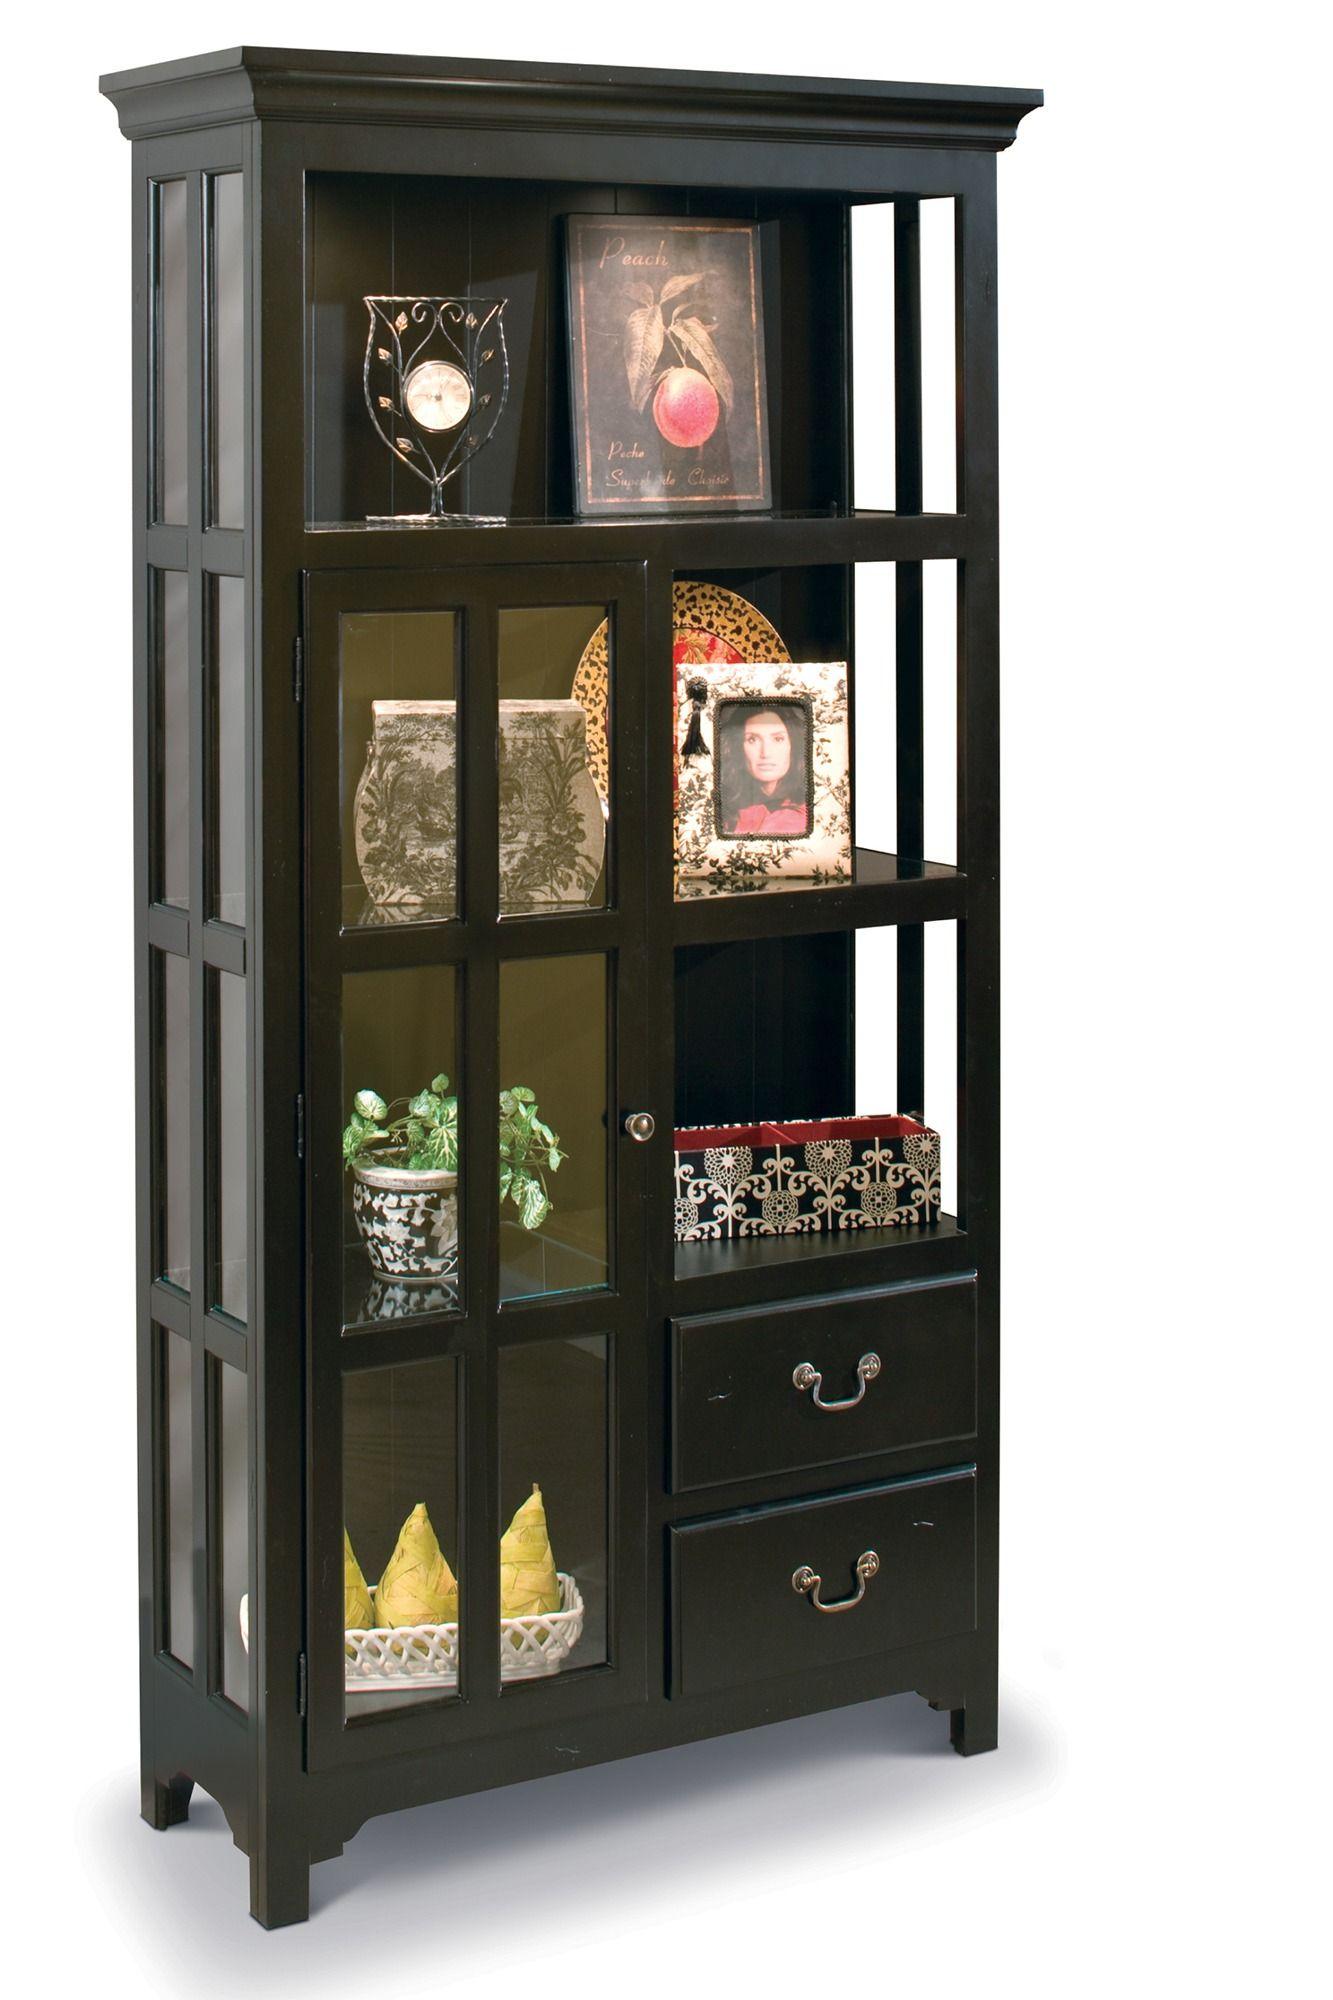 New Haven Display Cabinet In Black | Philip Reinisch | Home Gallery Stores